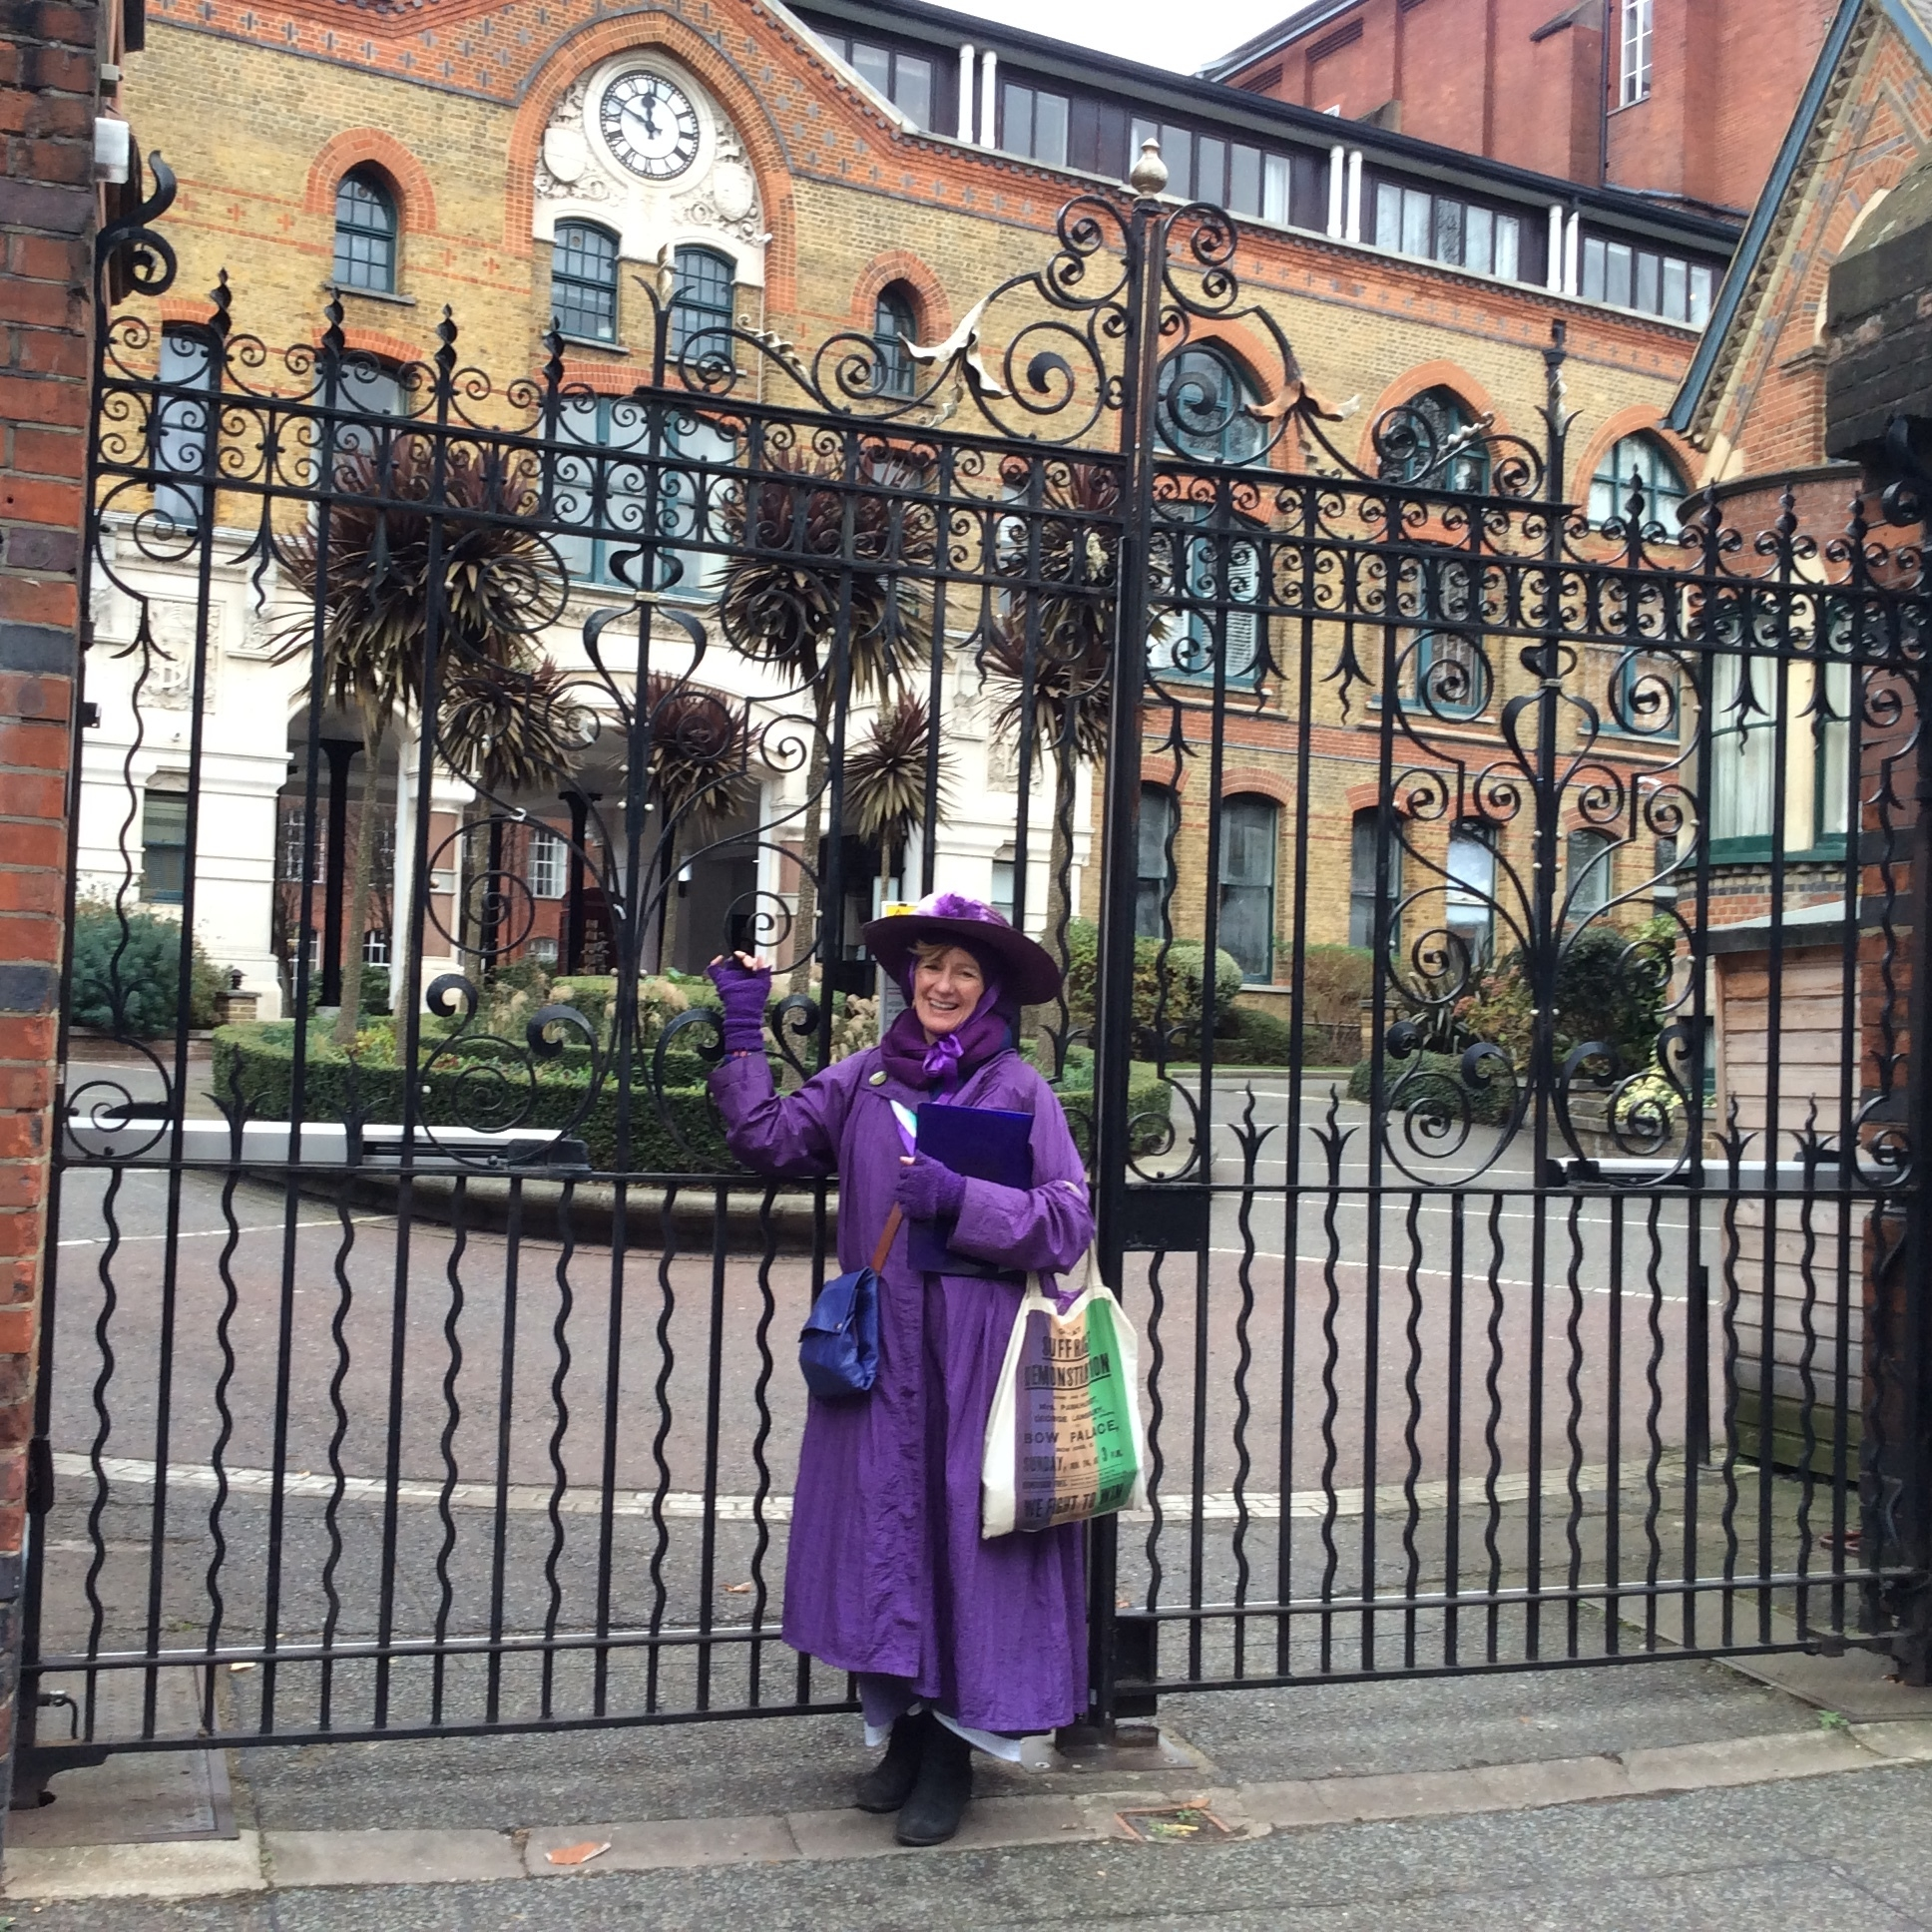 the-blackheath society events maureen corcoran suffragette walk and talk